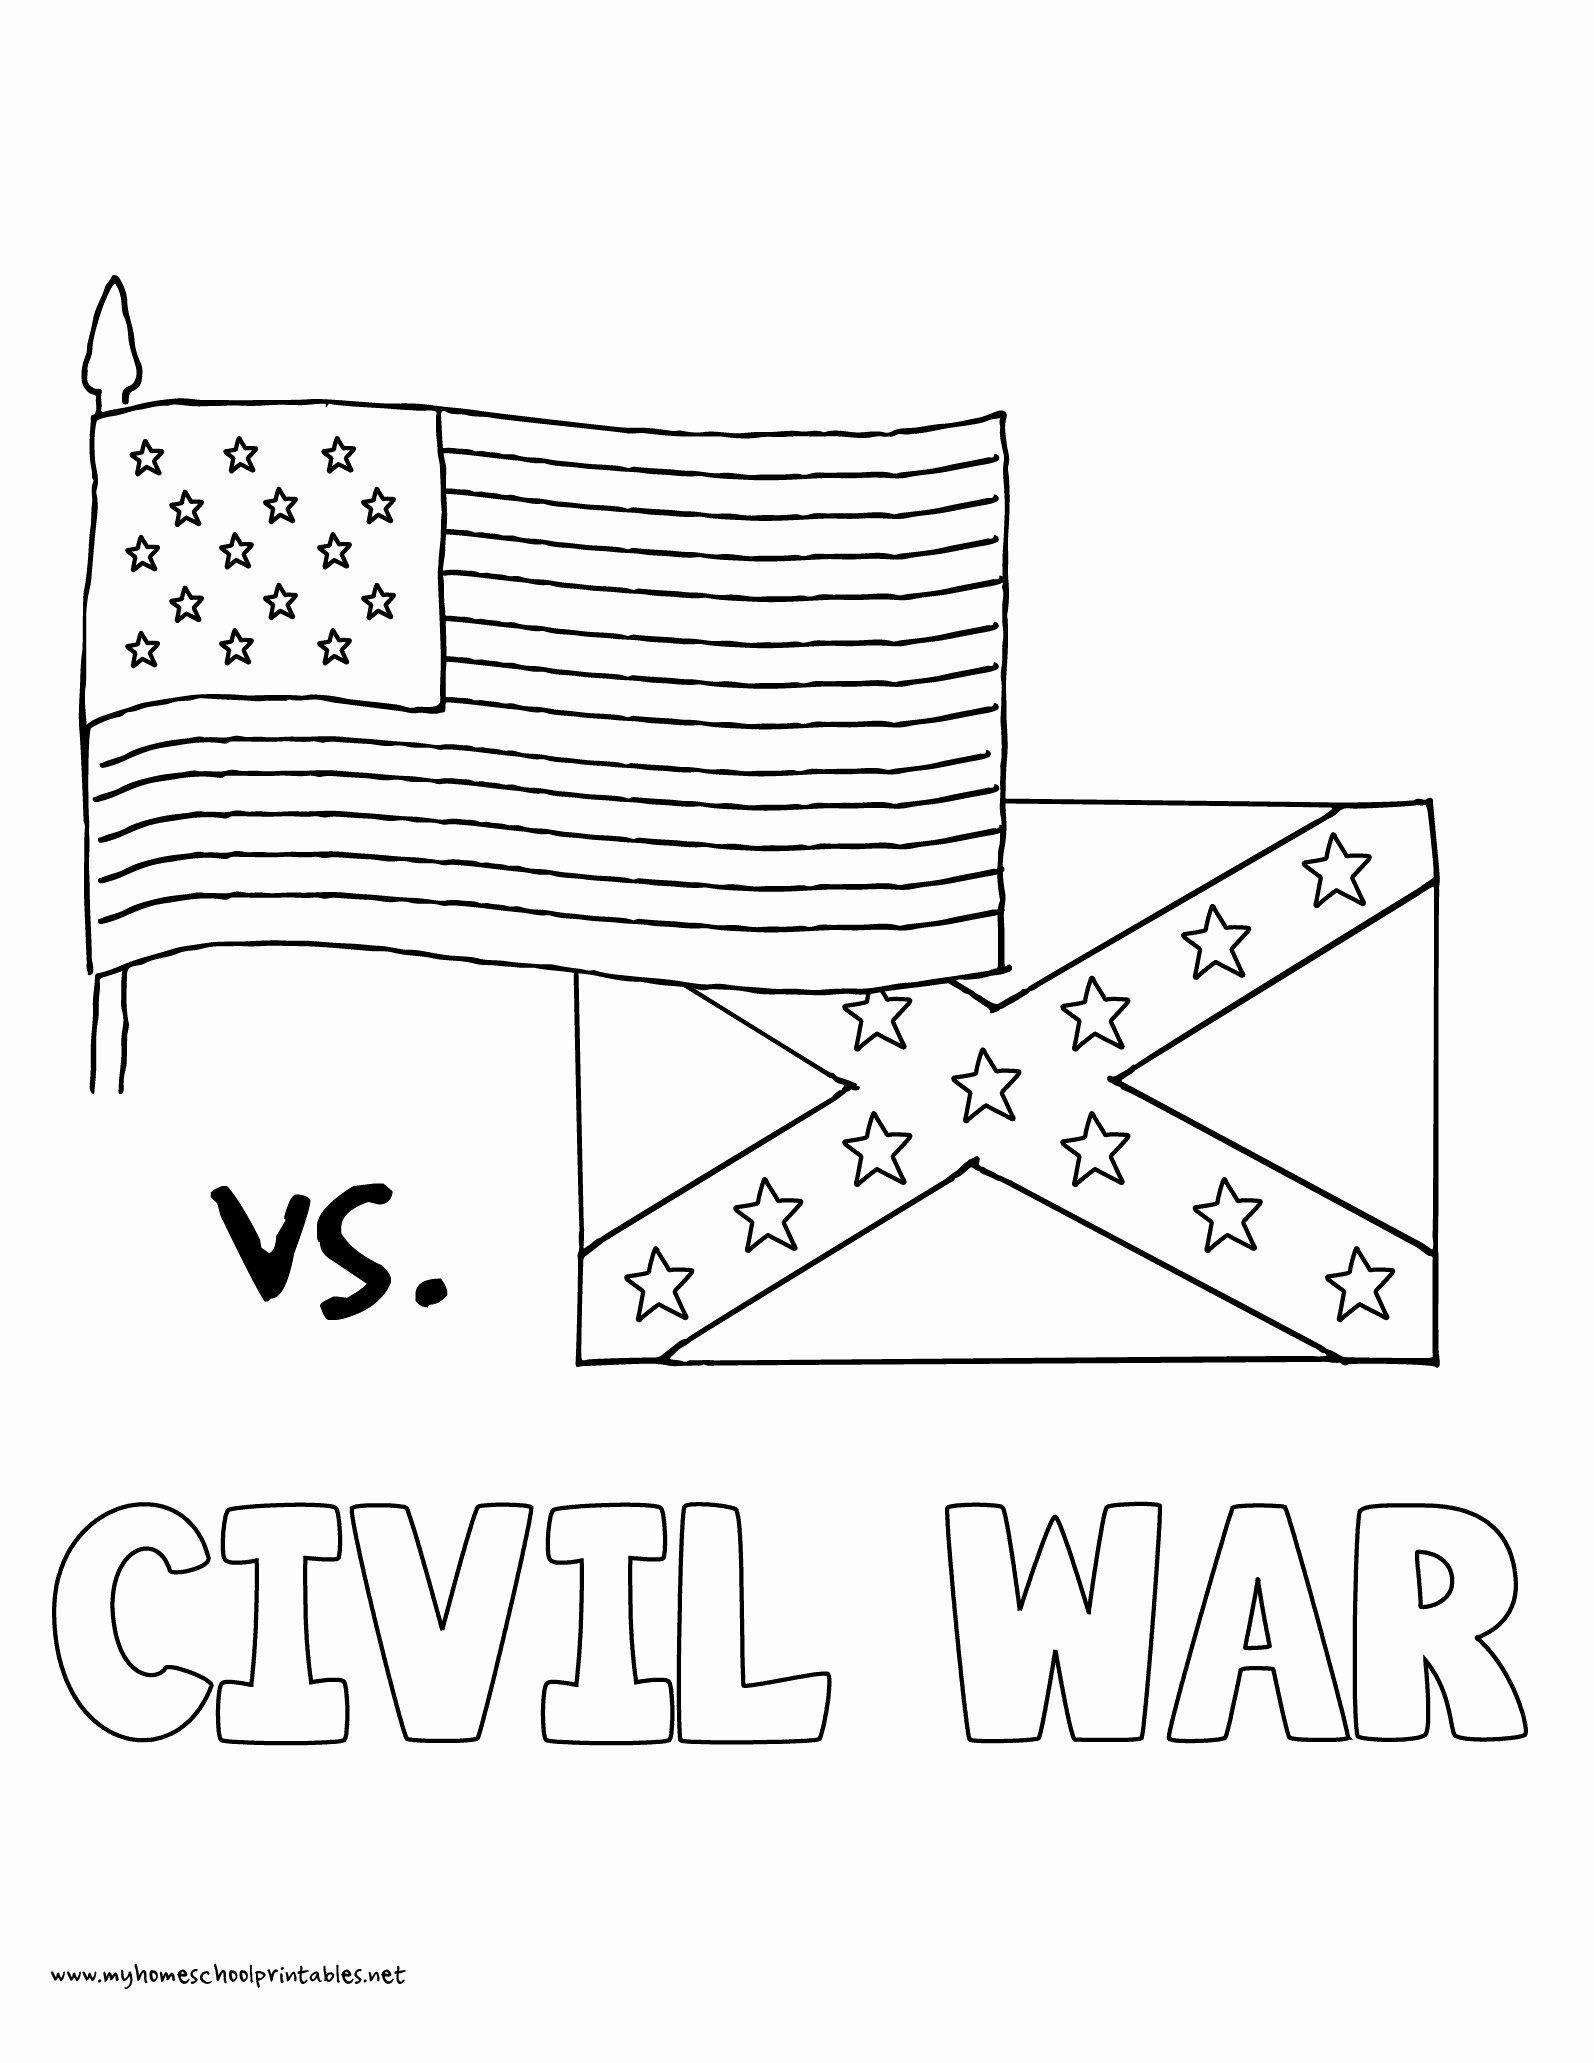 Coloring Sheets Of History Inspirational Elegant Union Flag Civil War Coloring Page Ucandate [ 2063 x 1594 Pixel ]